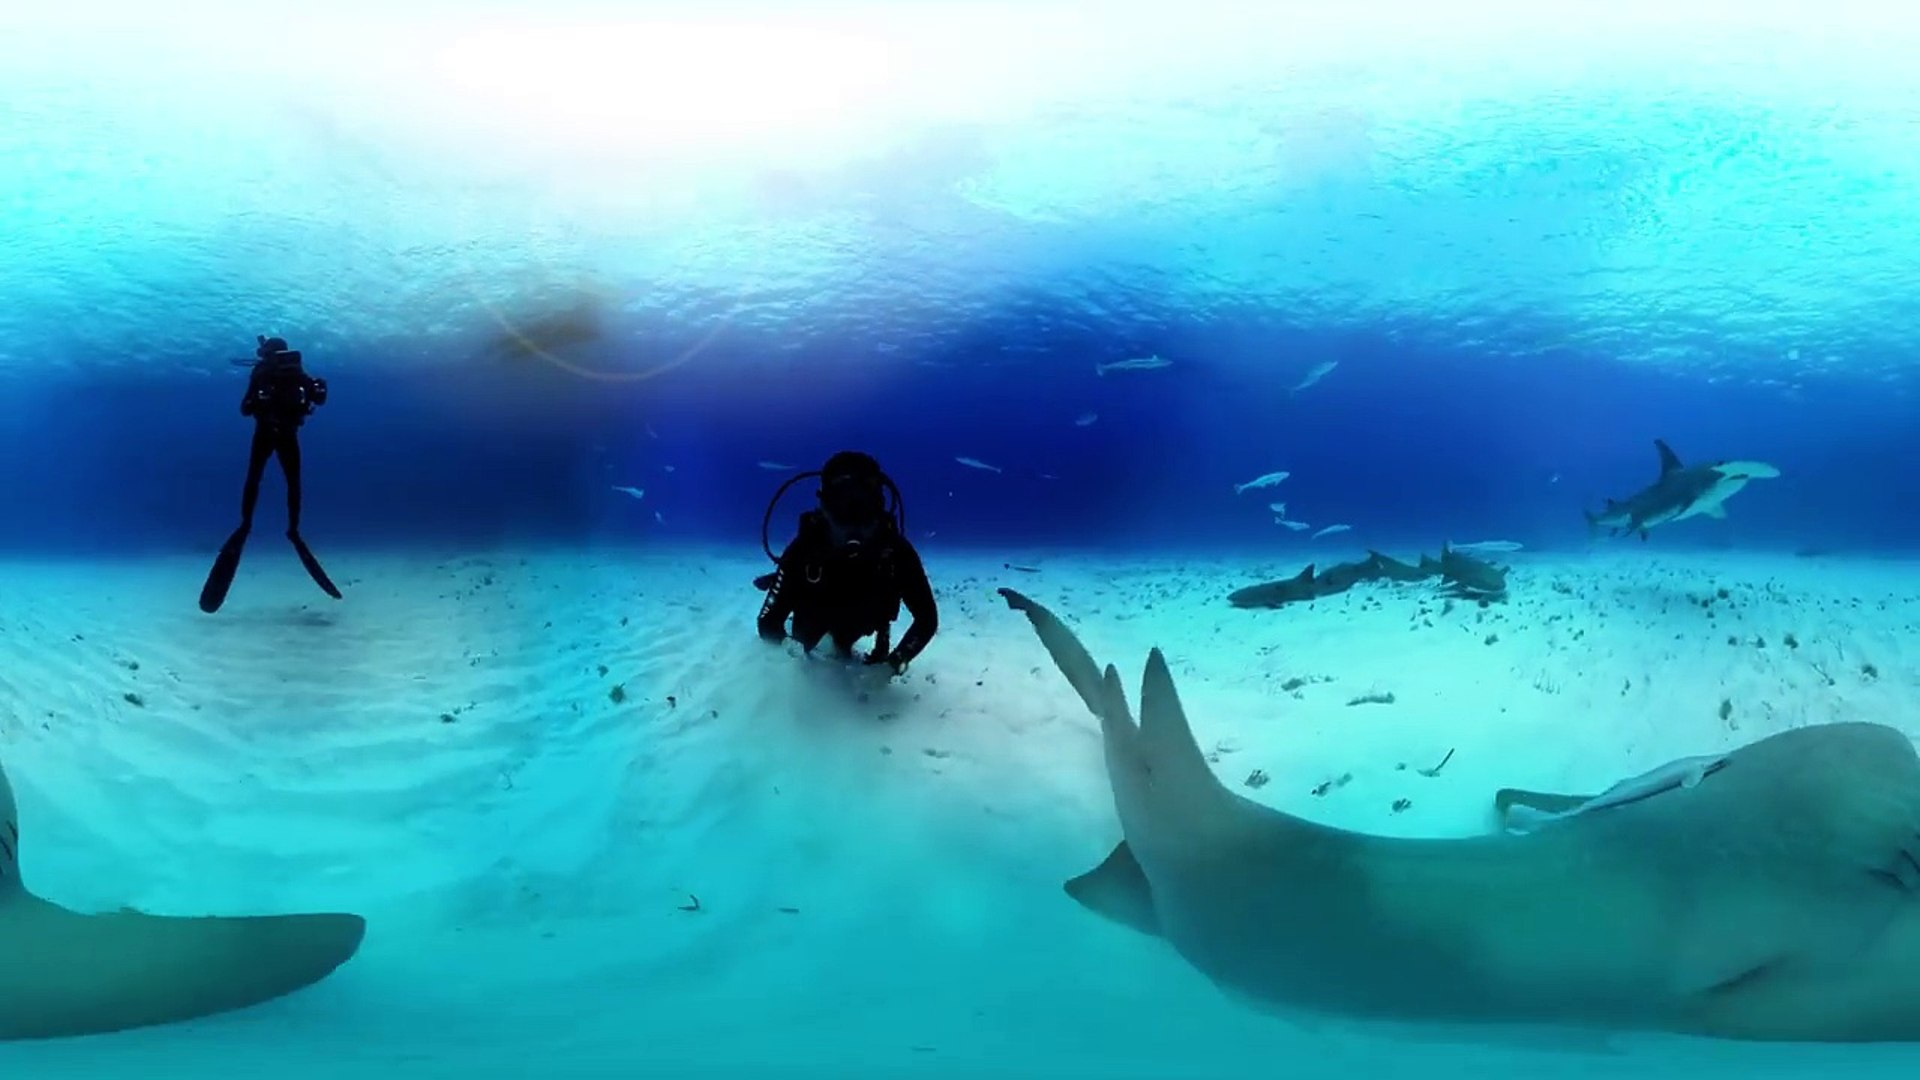 360 Great Hammerhead Shark Encounter | Collater.al